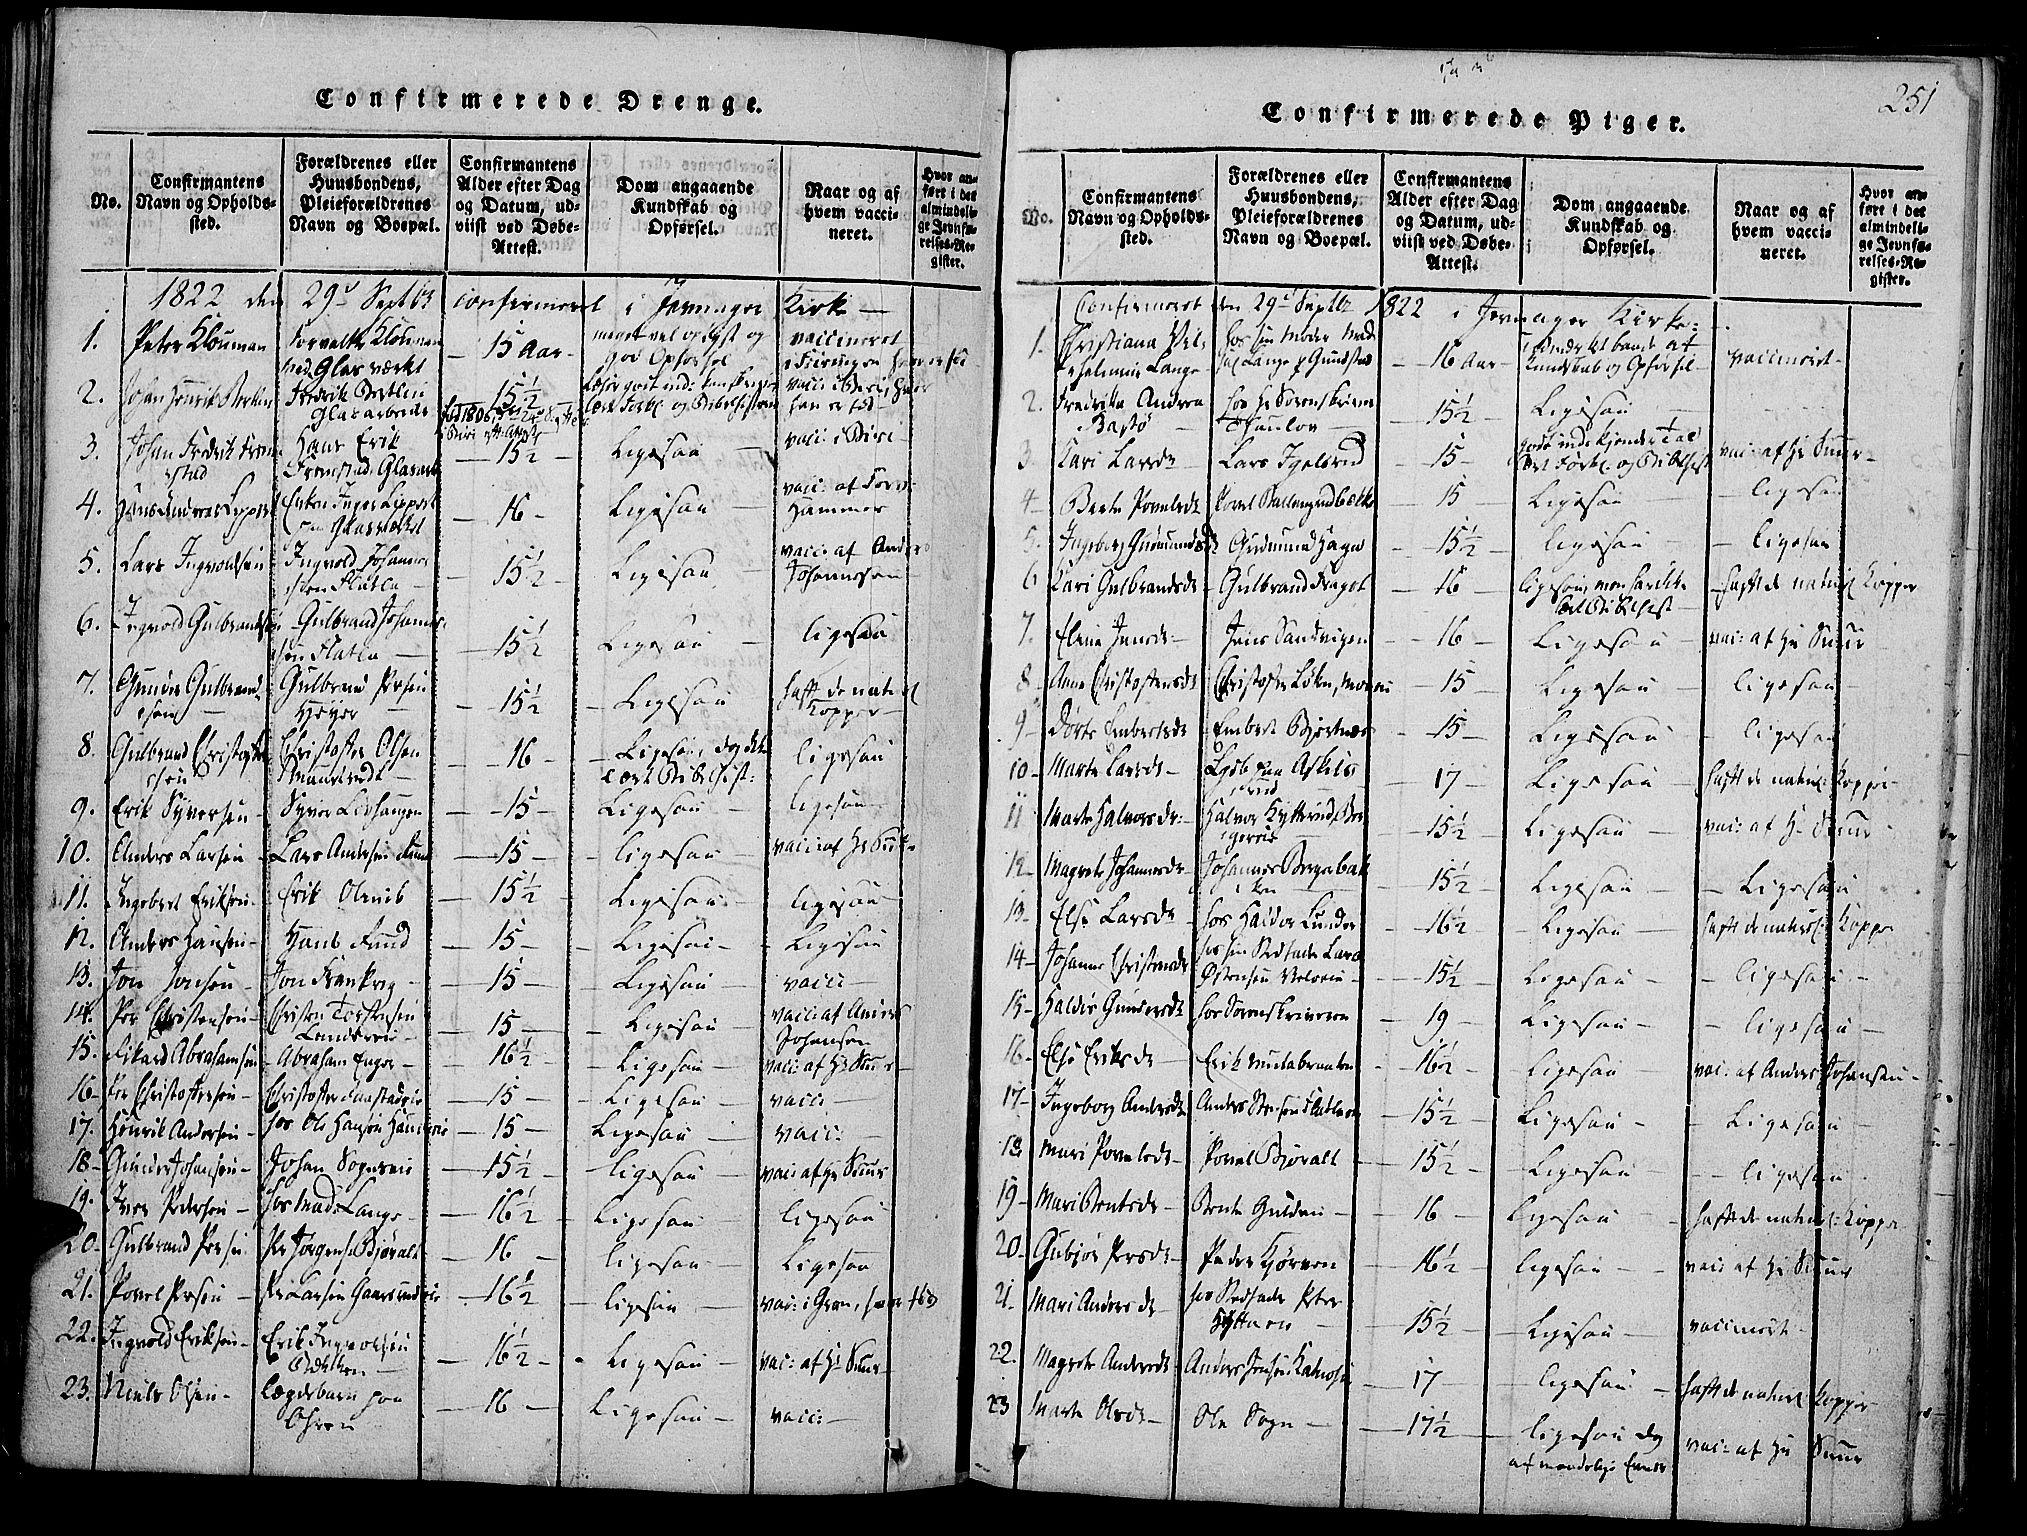 SAH, Jevnaker prestekontor, Ministerialbok nr. 5, 1815-1837, s. 251